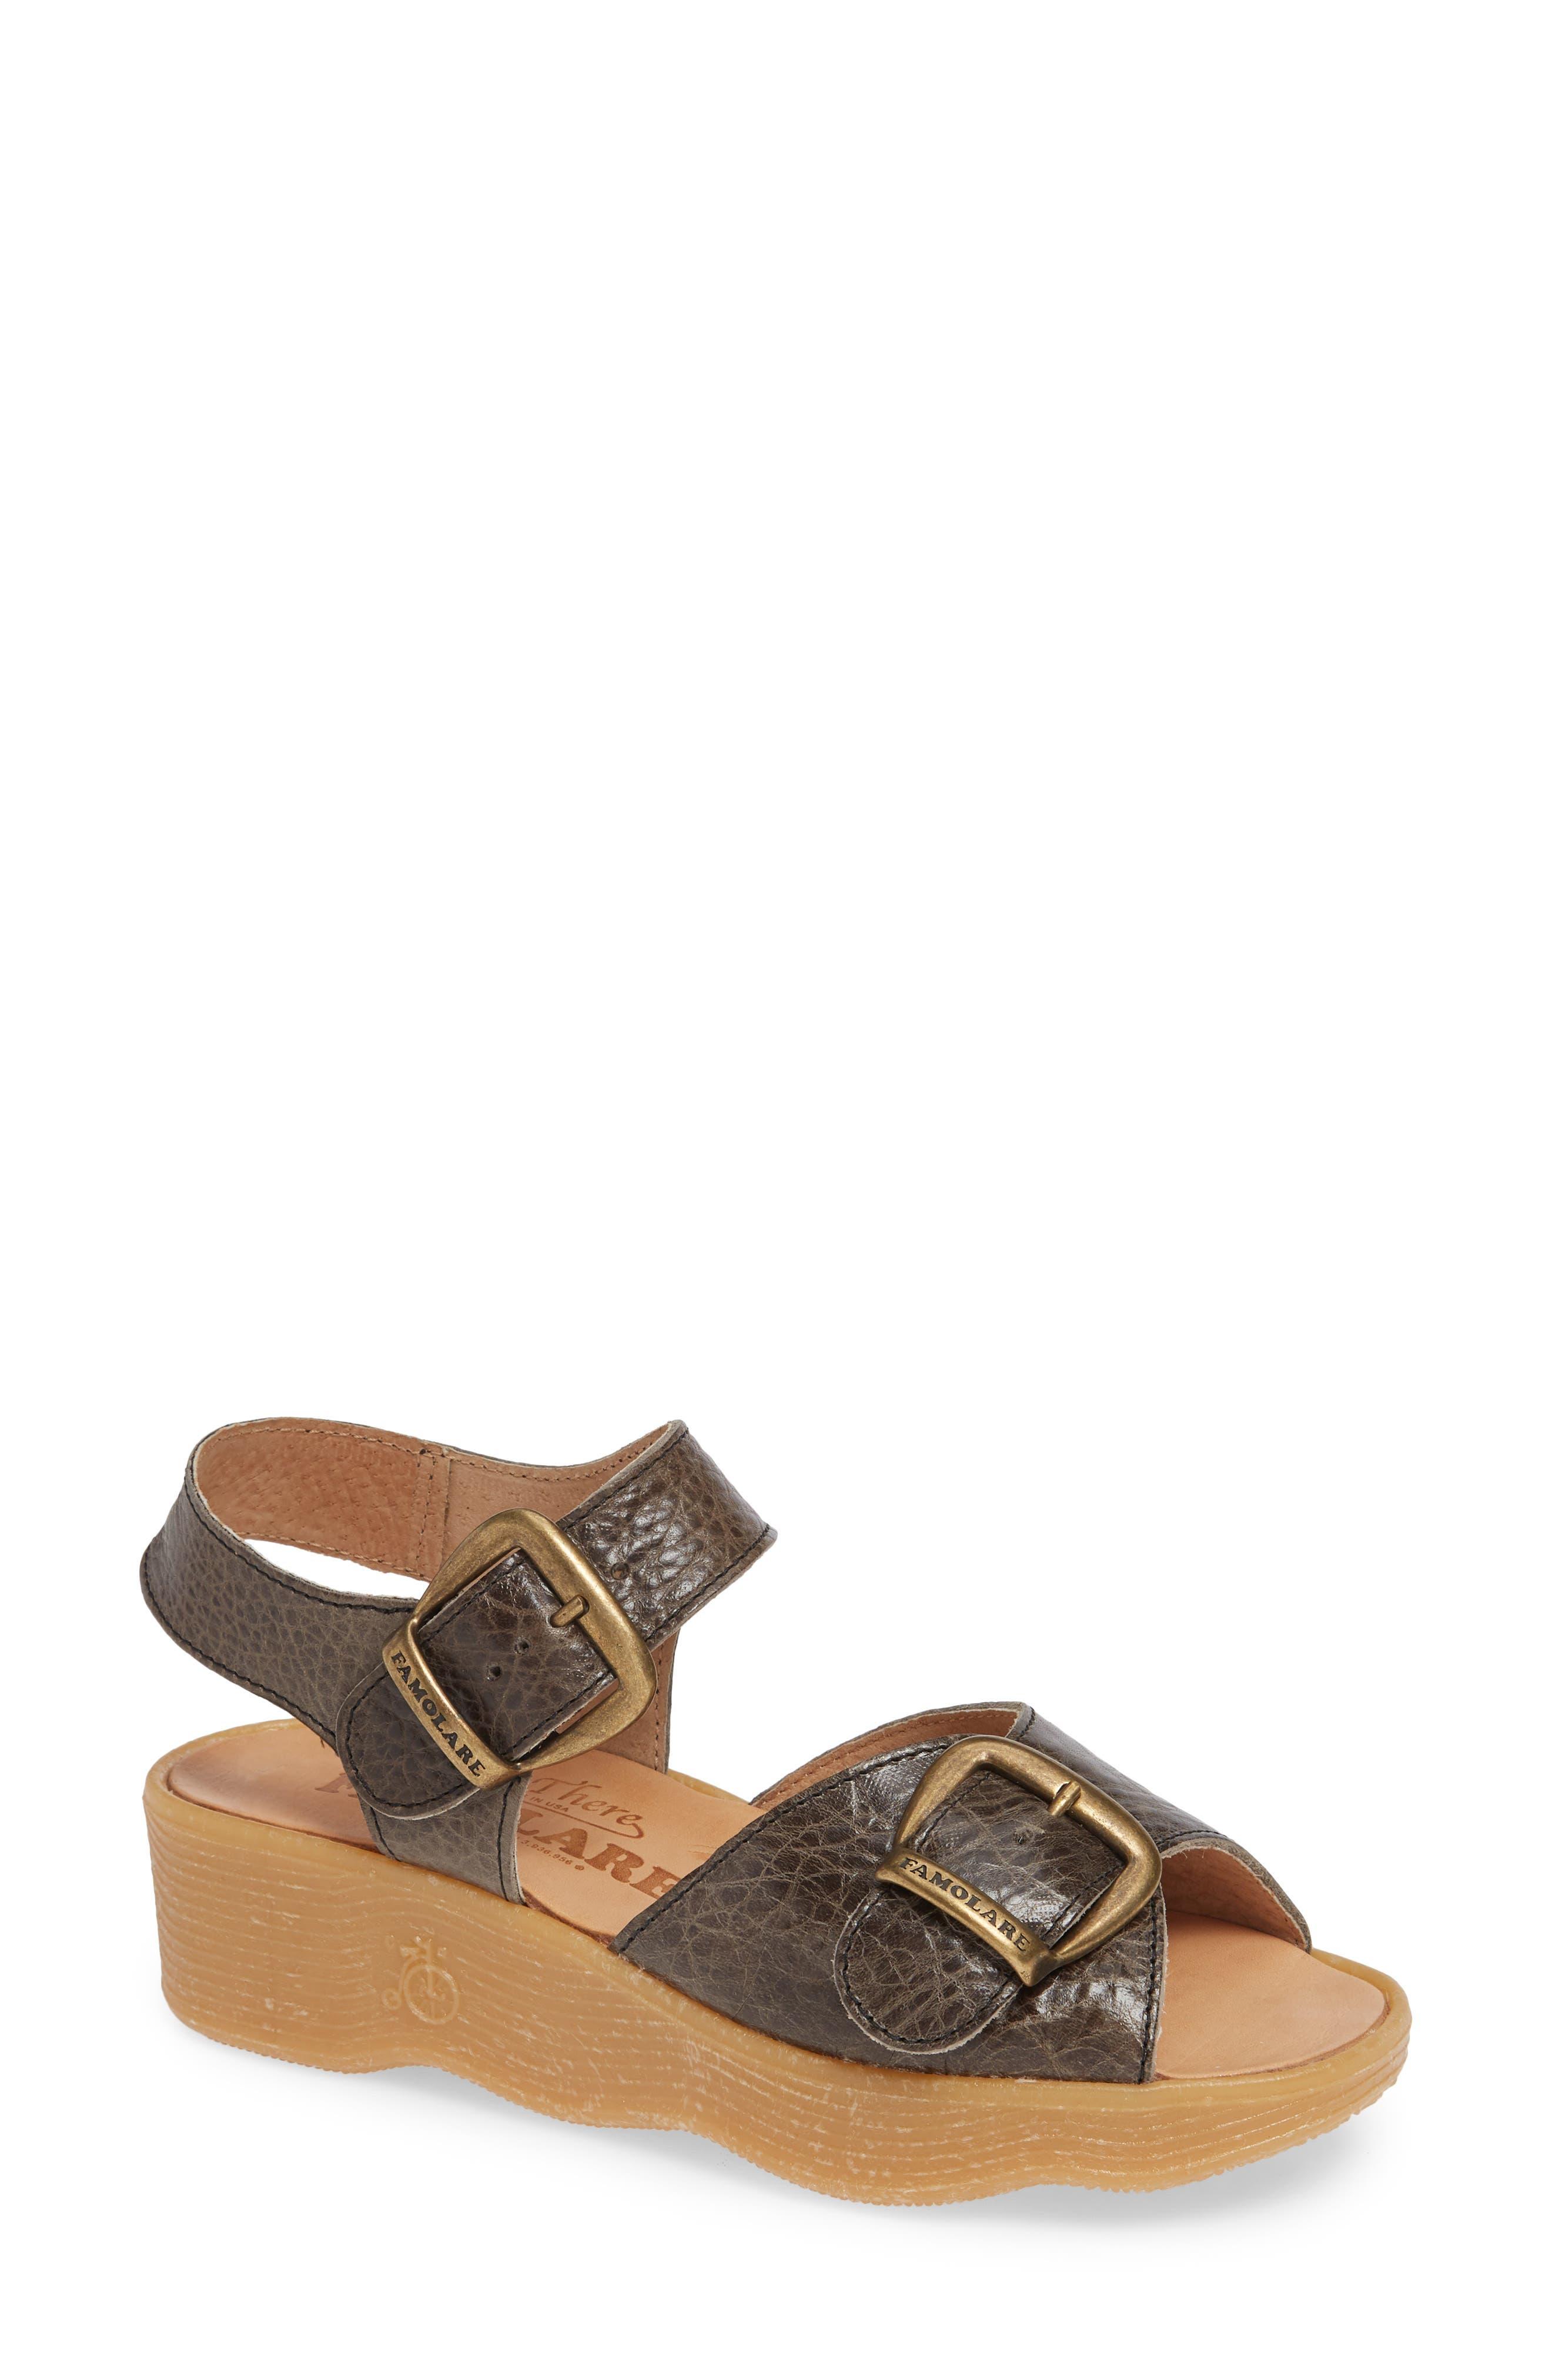 FAMOLARE, Double Play Platform Sandal, Main thumbnail 1, color, STEEL SUEDE